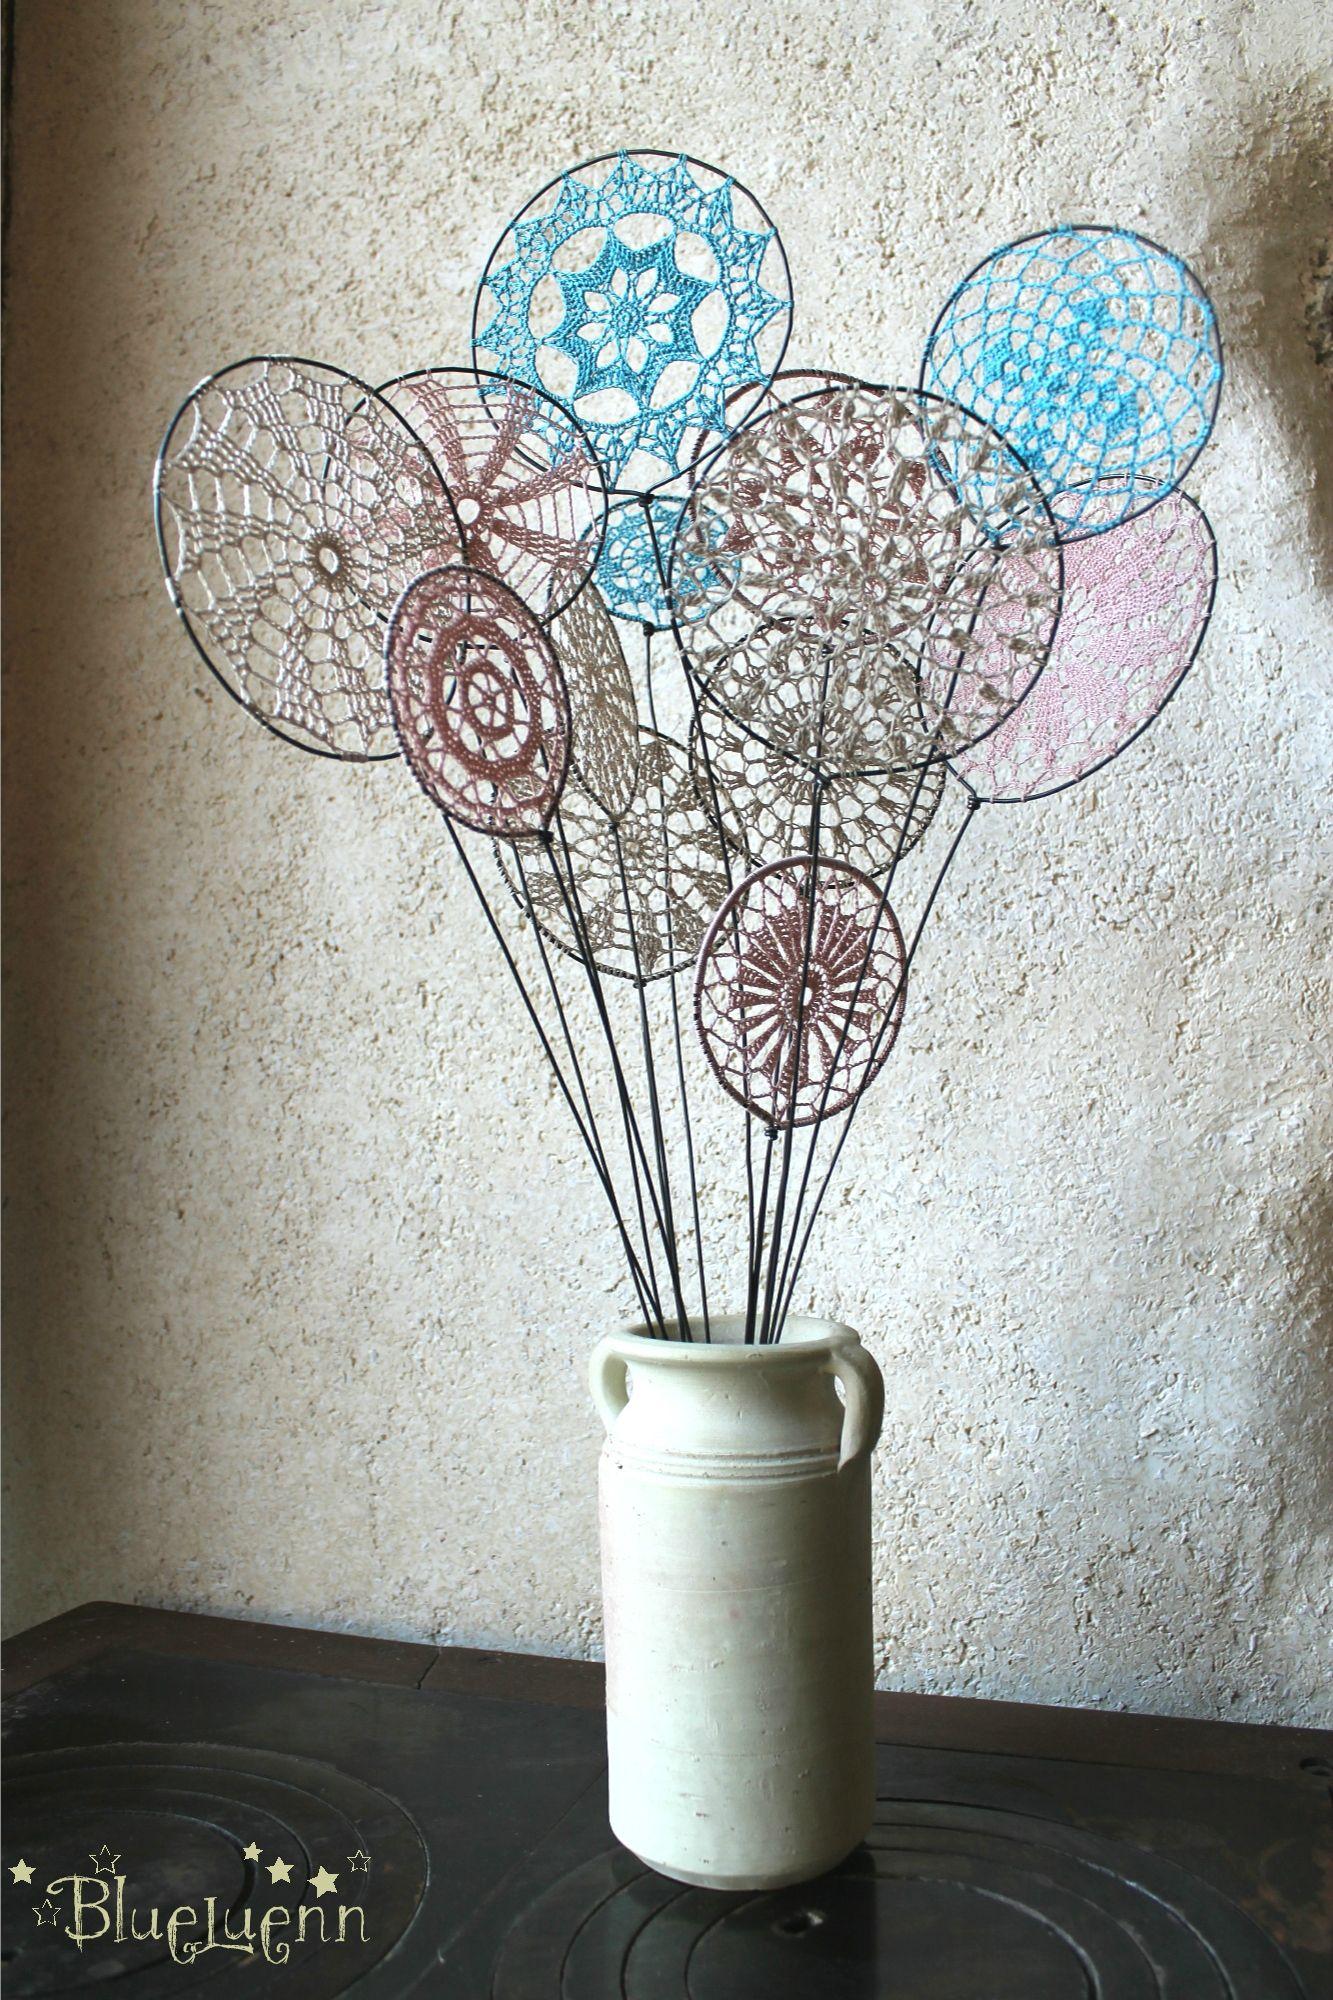 crochet magic from Blueluenn. | Cynthia Dwyer | Pinterest ...